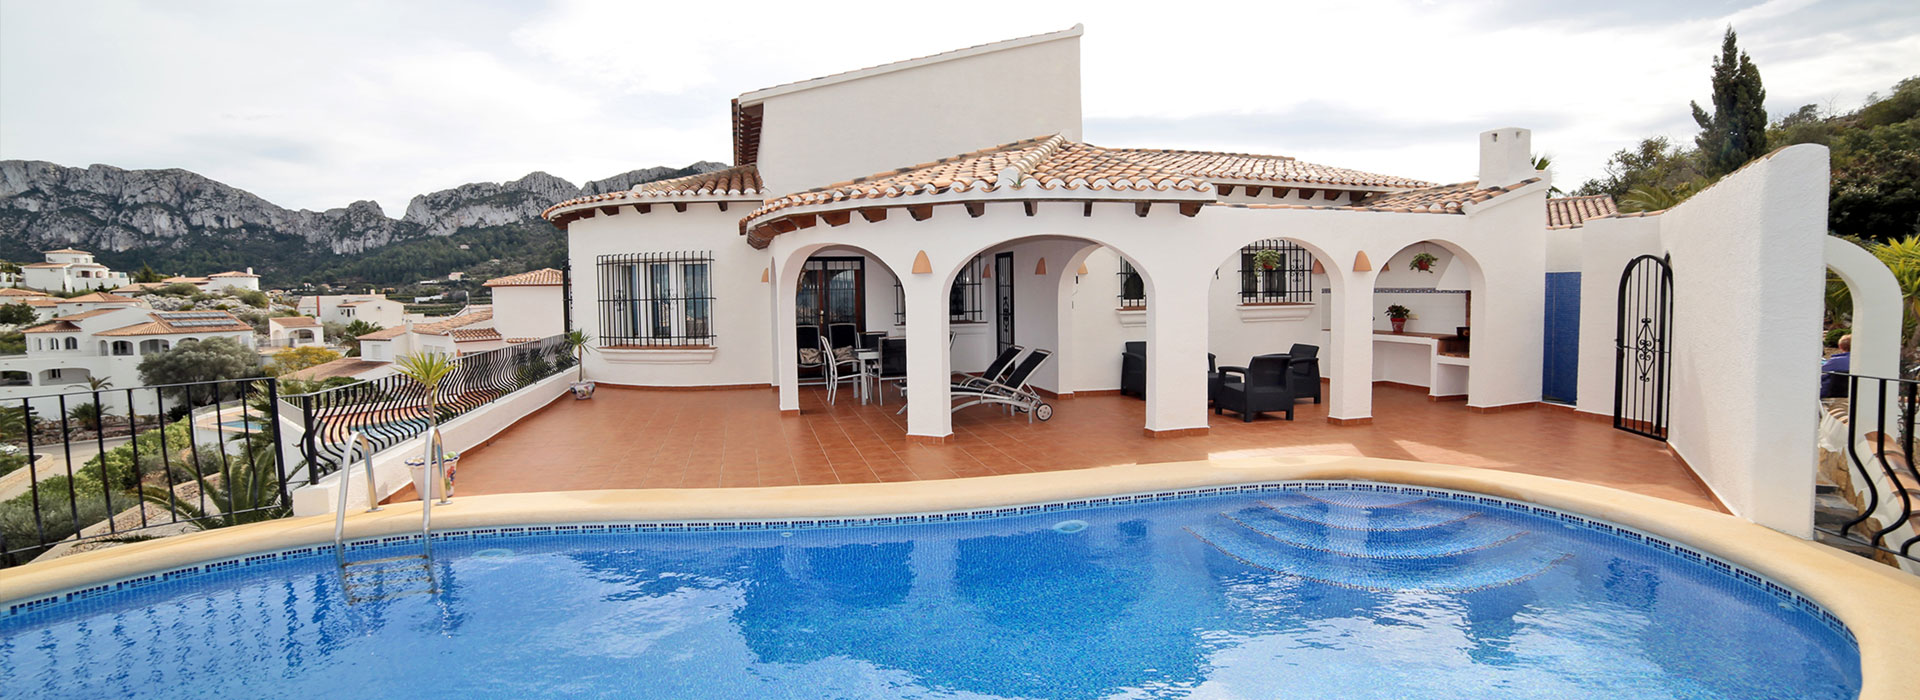 acb.immo - Magnifique villa de 6 chambres à Monte Pego, Denia